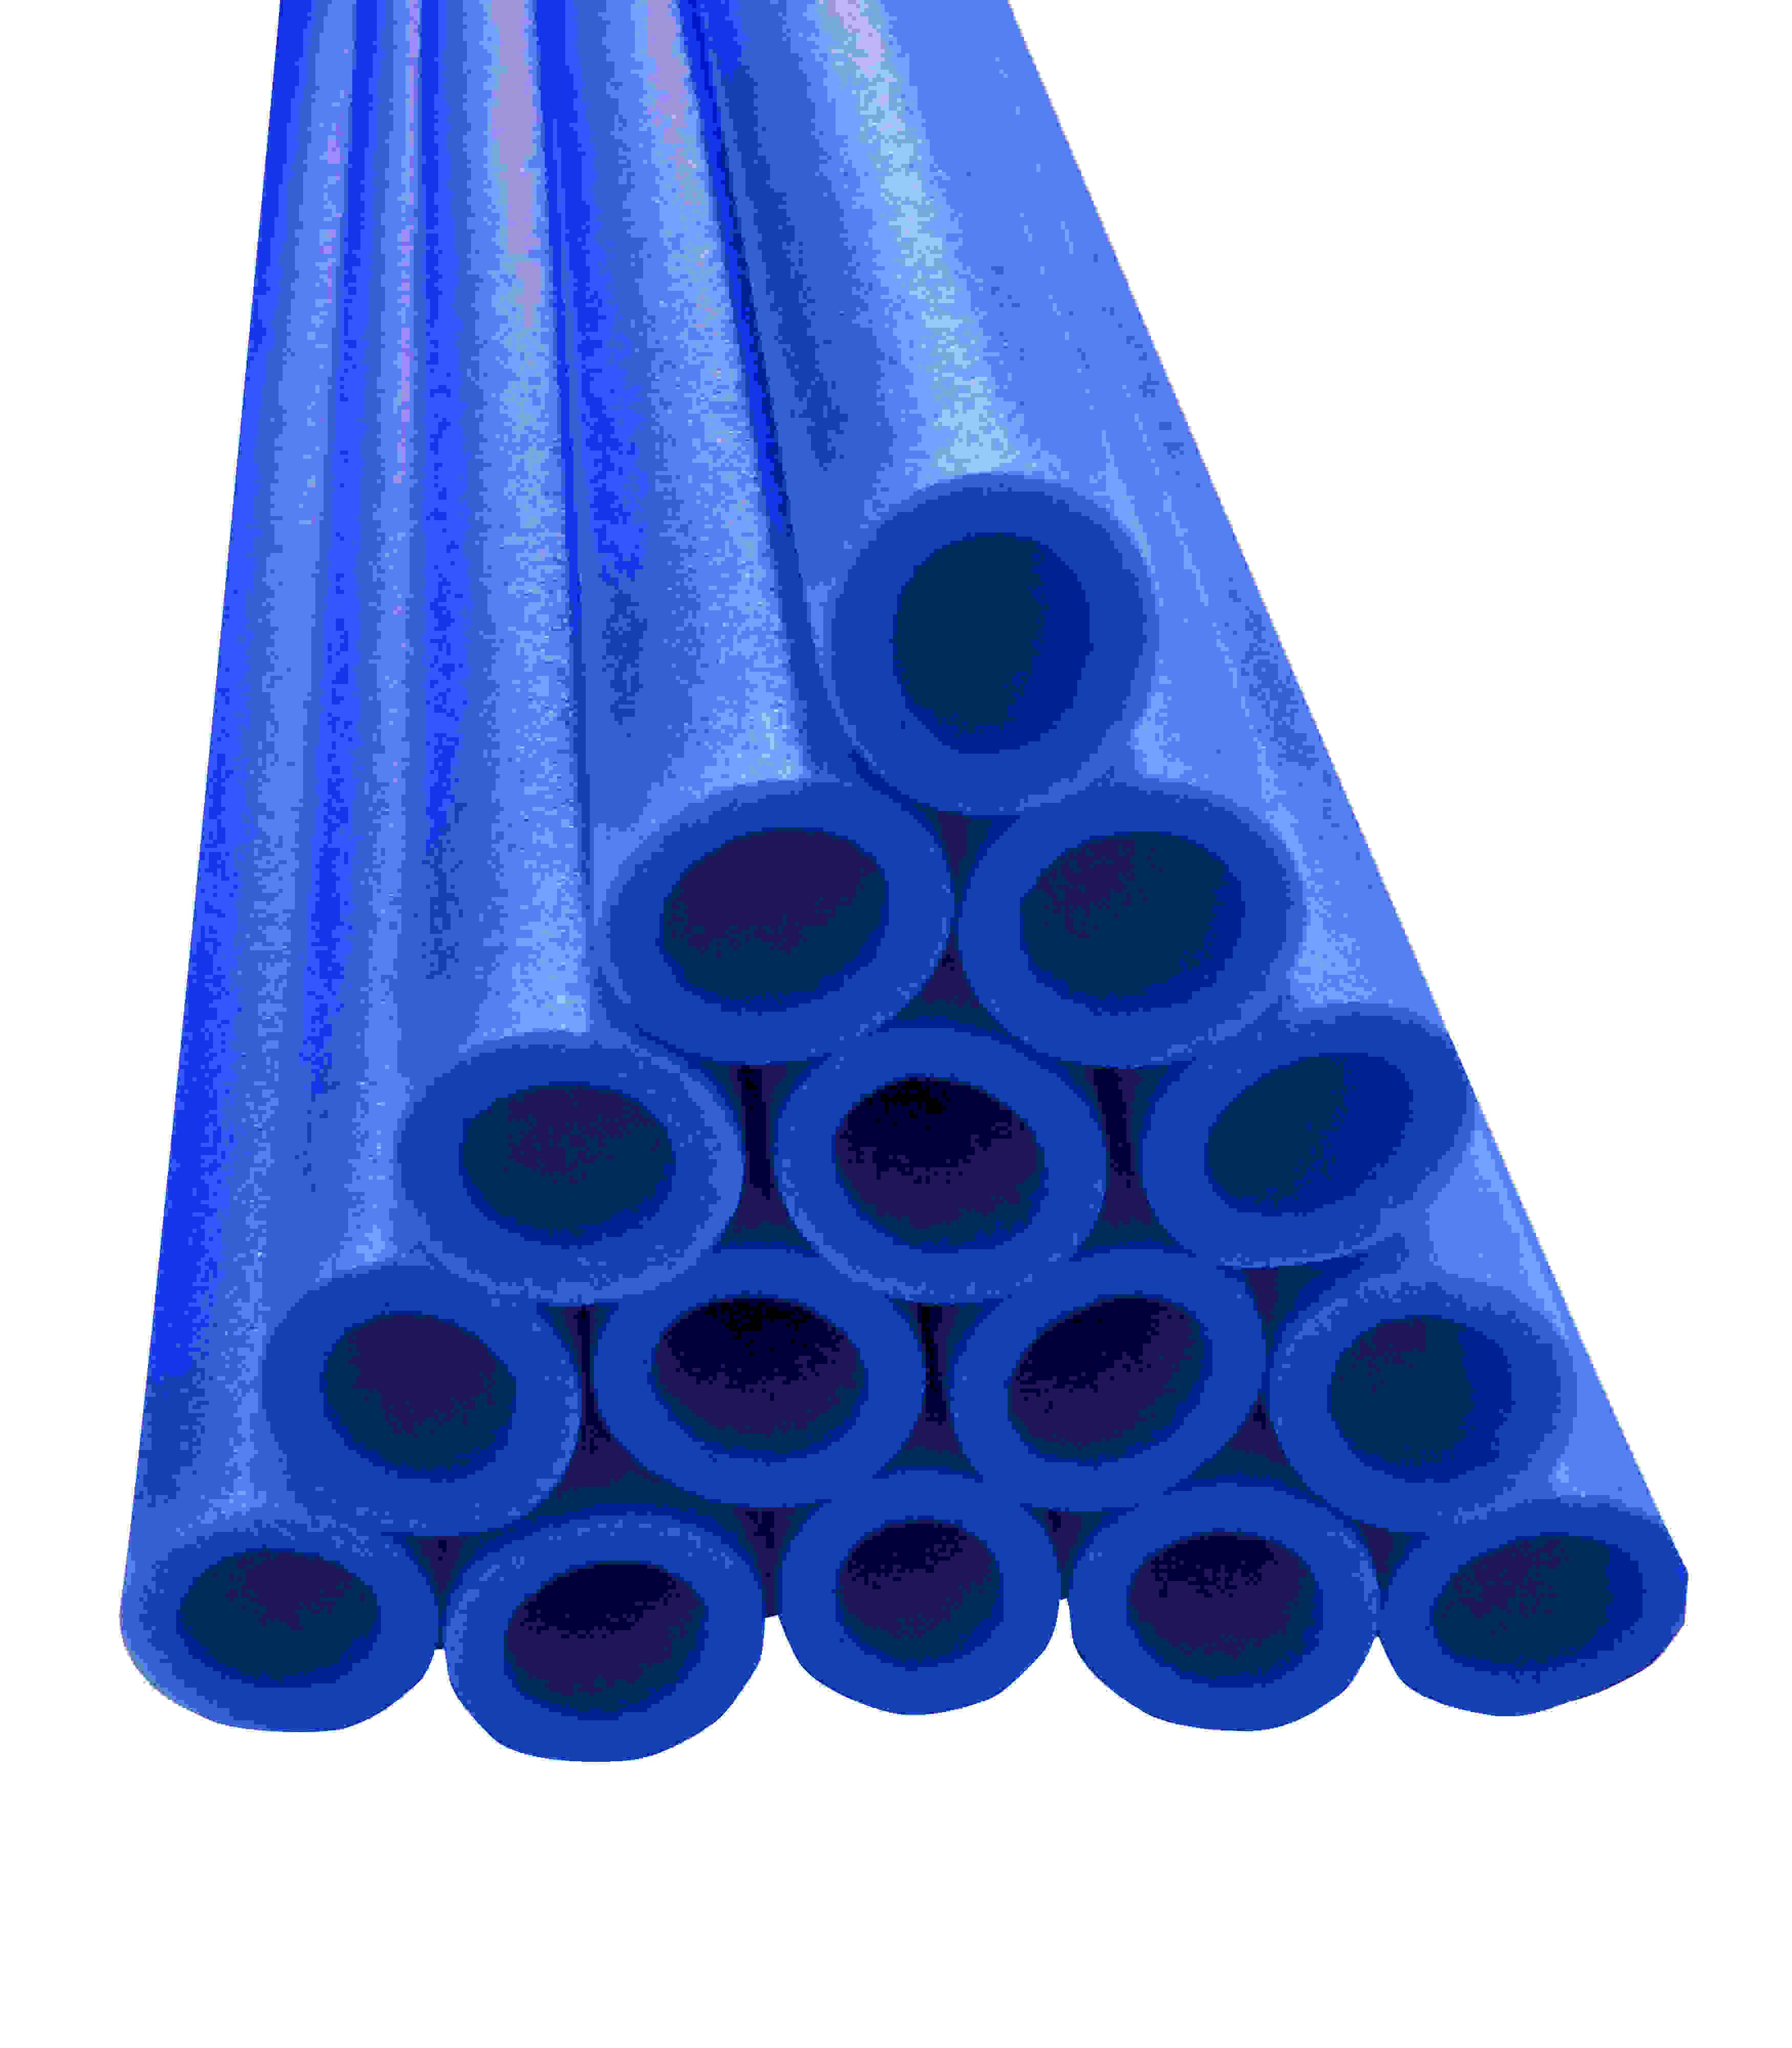 "33 Inch Trampoline Pole Foam sleeves, fits for 1"" Diameter Pole - Set of 12 -Blue"